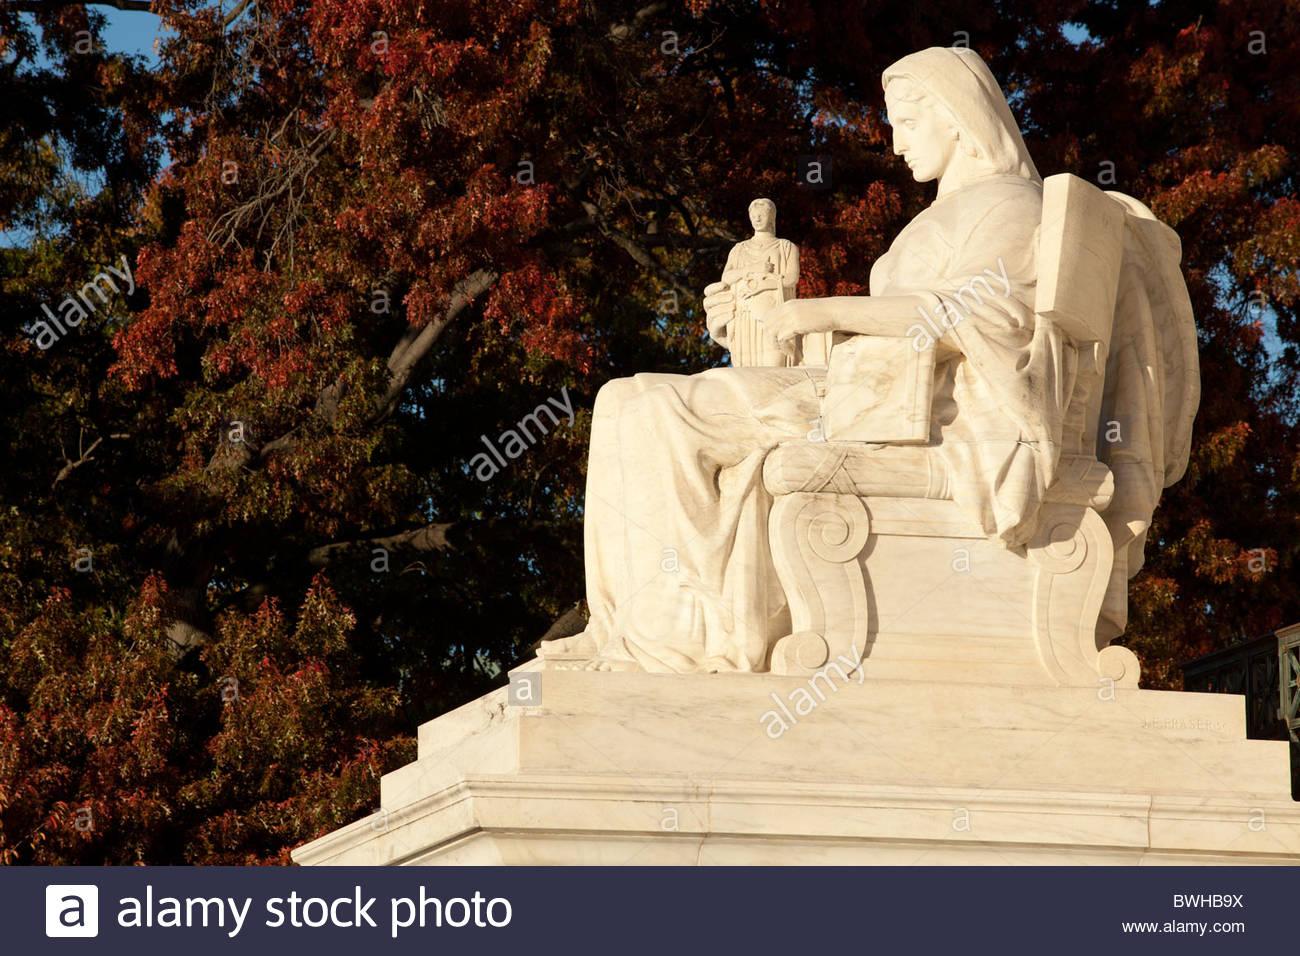 Contemplation of Justice, Supreme Court Building, Washington, D.C., by James Earle Fraser - Stock Image